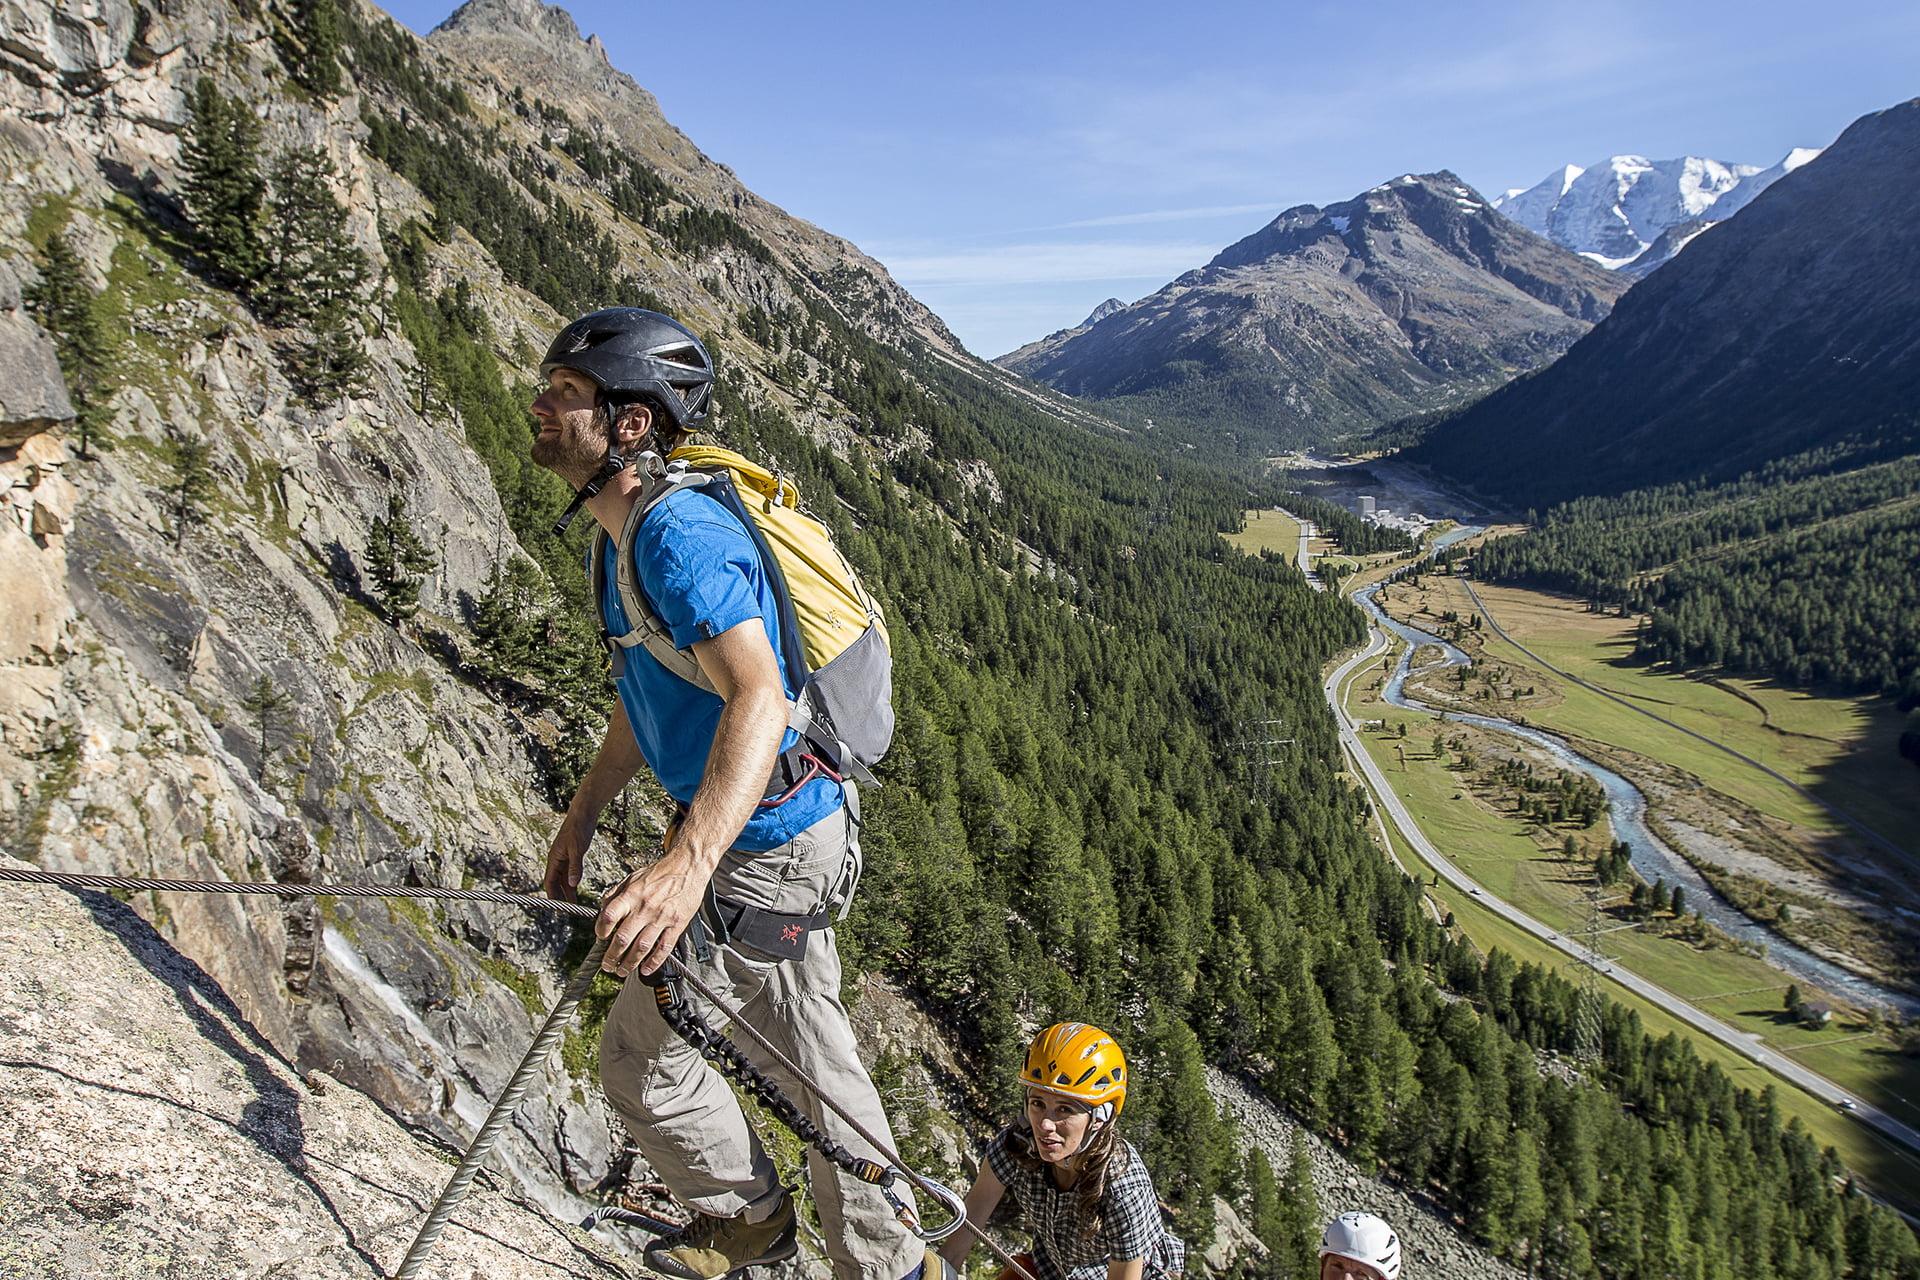 Klettersteig La Resgia : Klettersteig la resgia sommer in engadin st. moritz